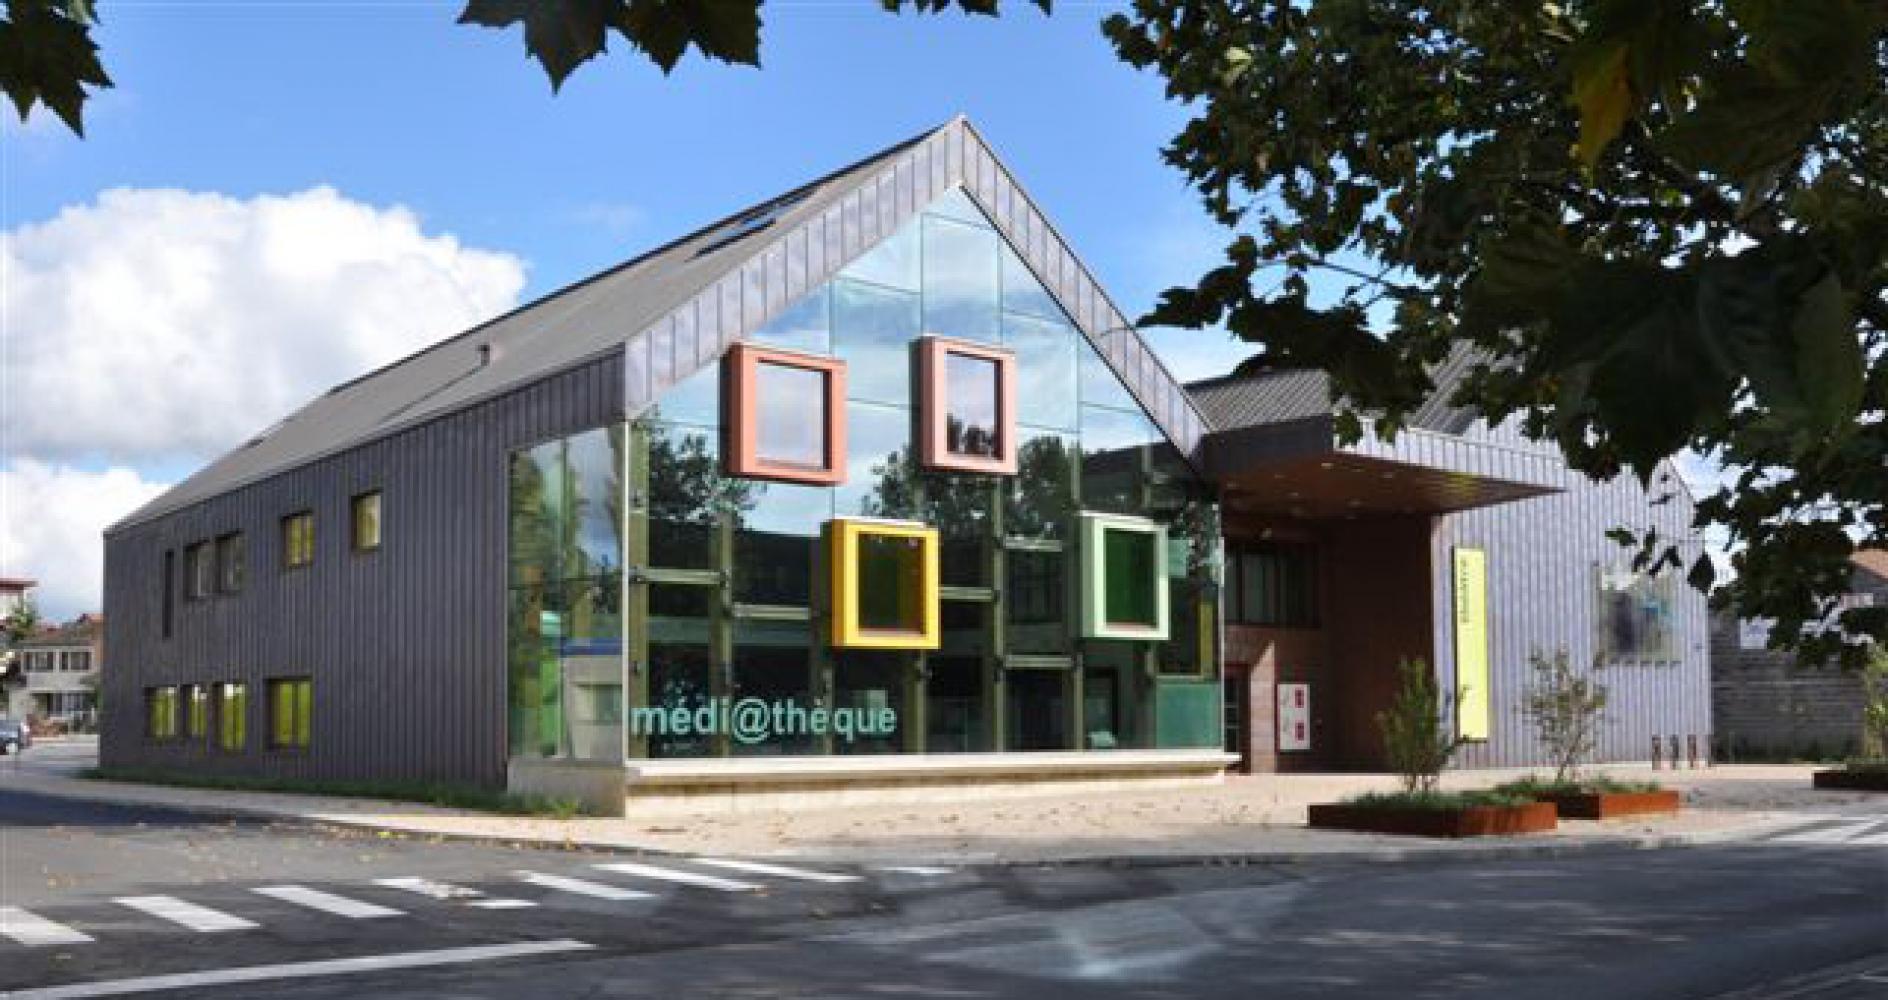 9-02-jarny-img-001 Pascale SEURIN Architecte - Culturel